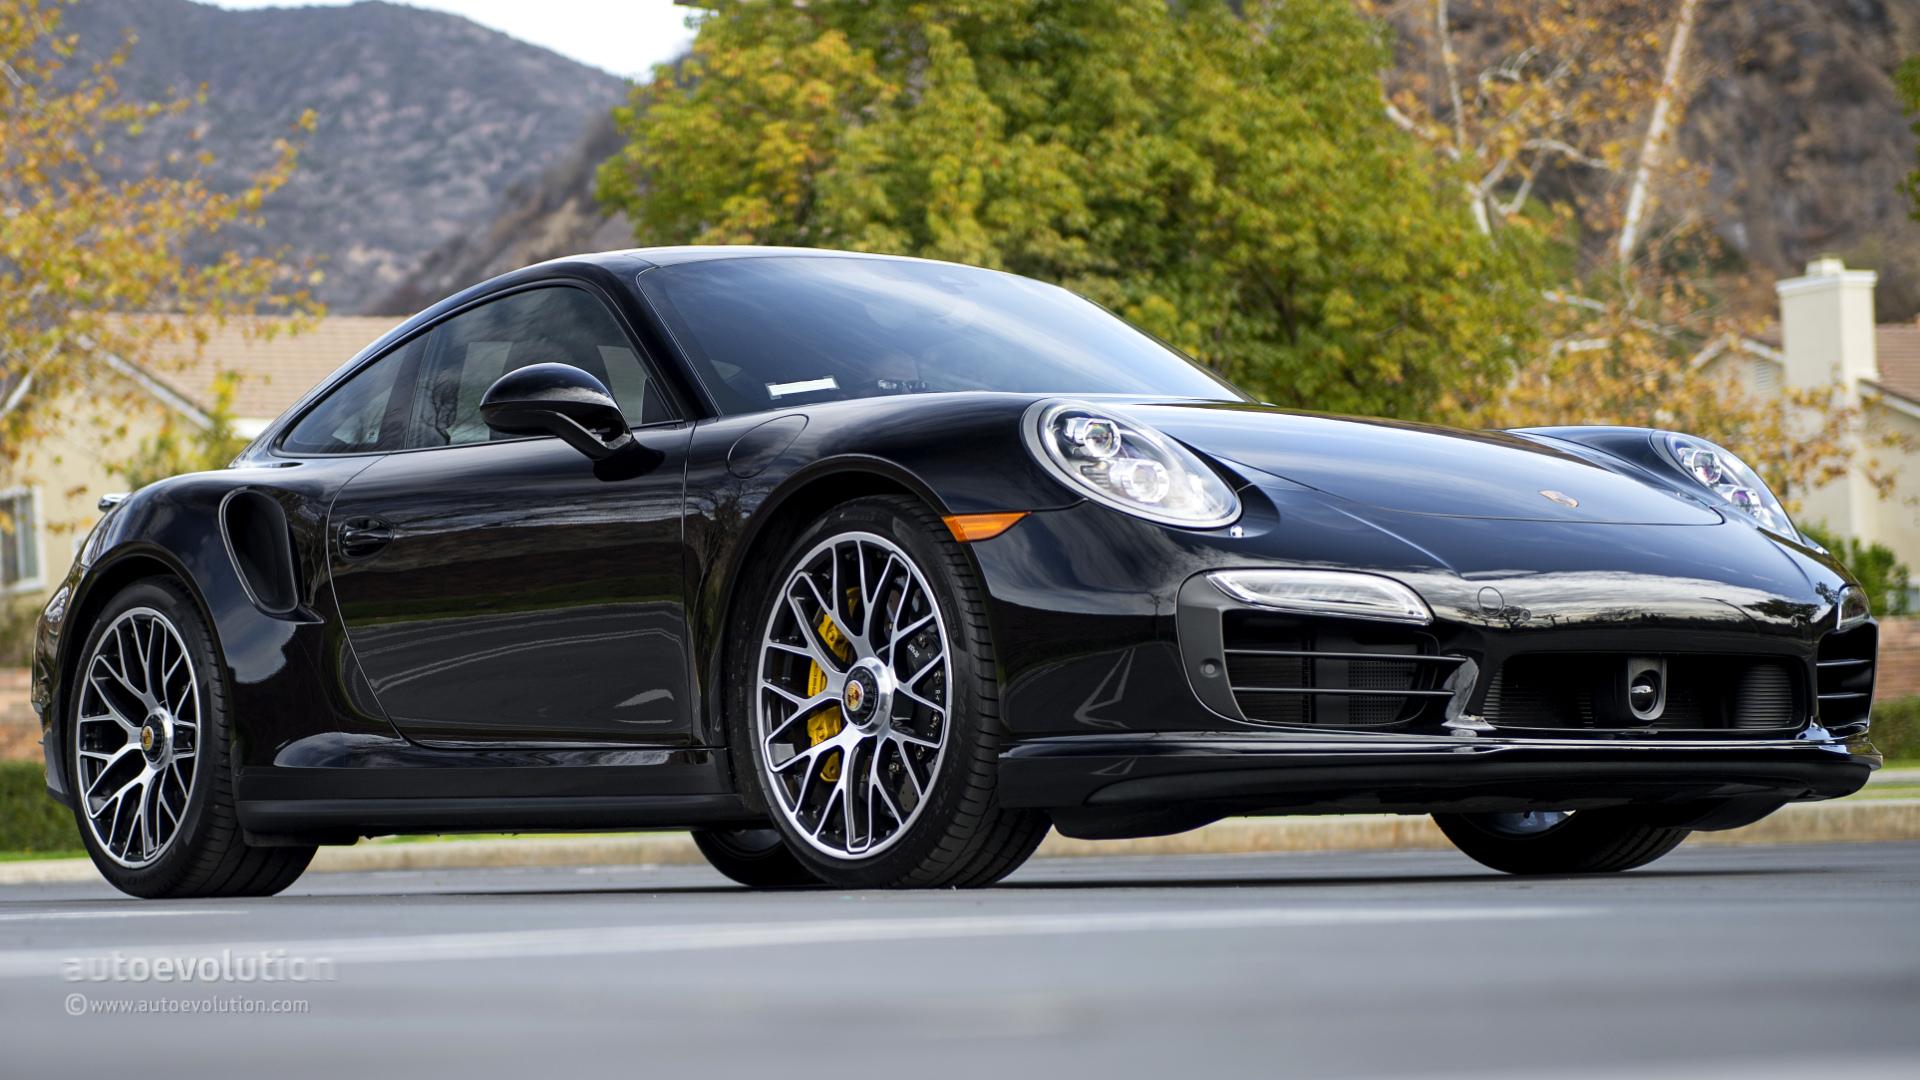 2014 porsche 911 turbo s review page 3 autoevolution. Black Bedroom Furniture Sets. Home Design Ideas